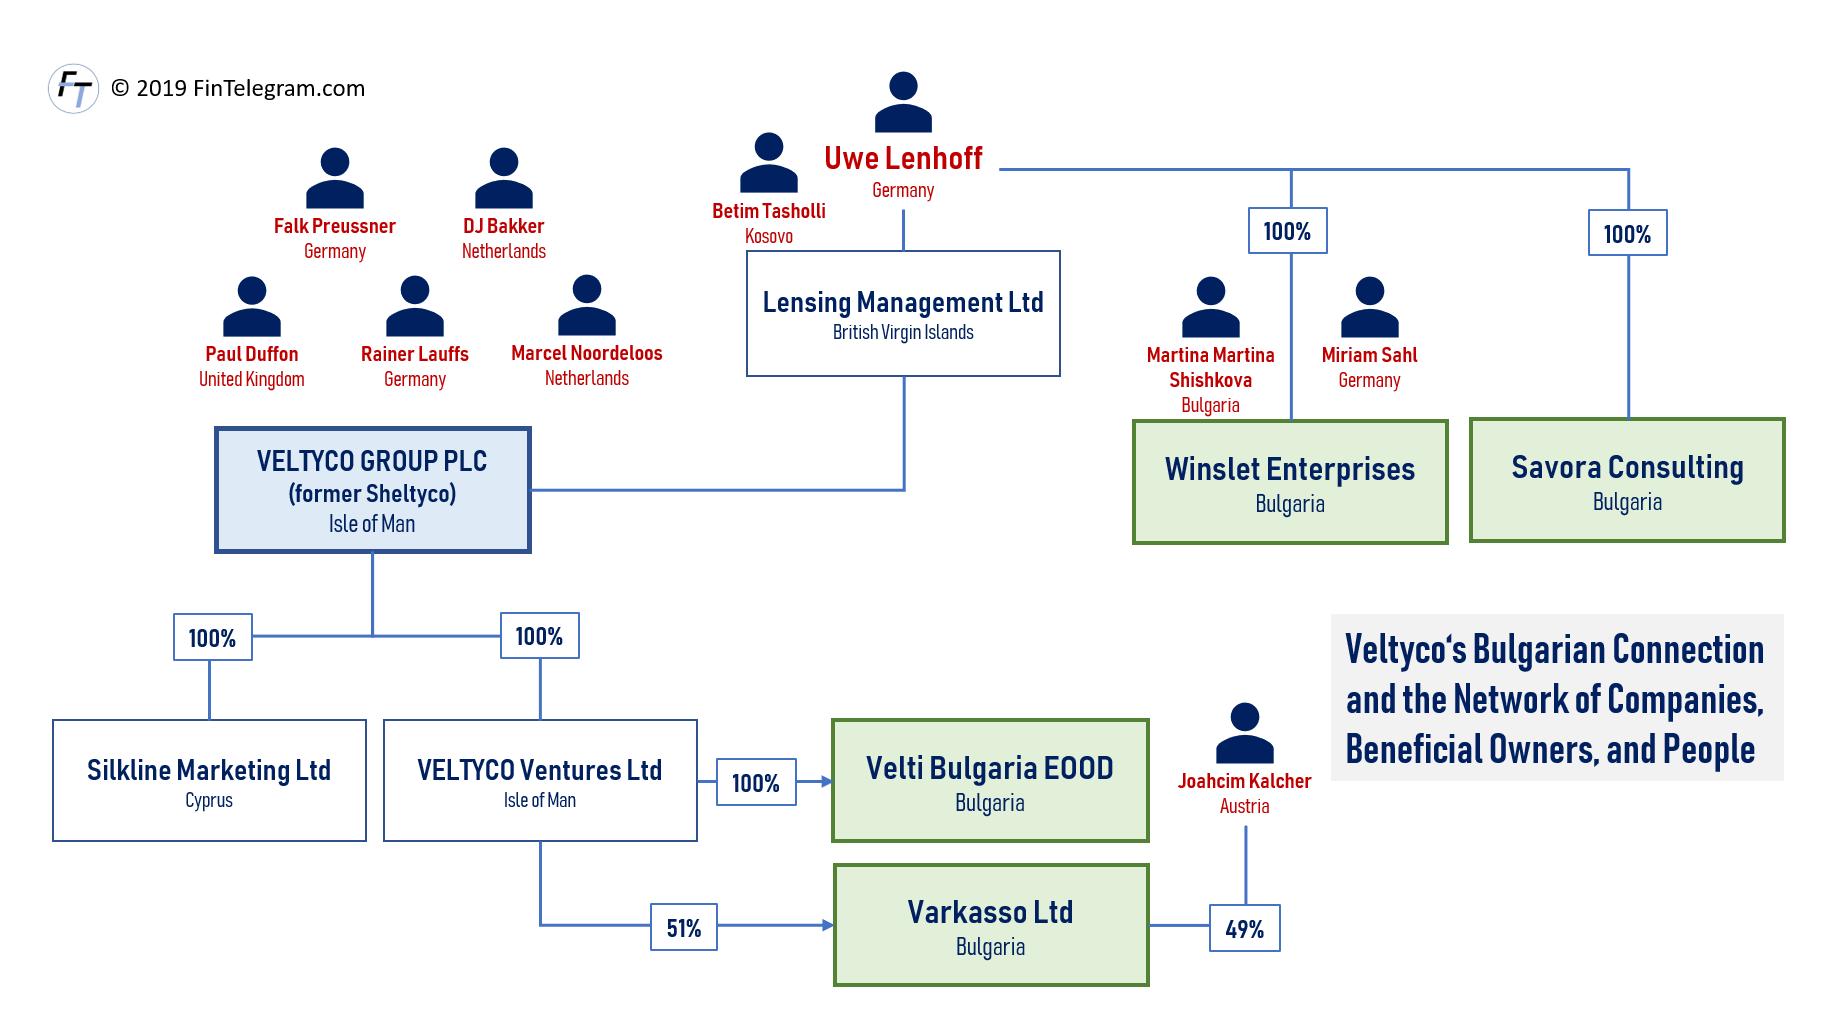 Veltyco network in Bulgaria